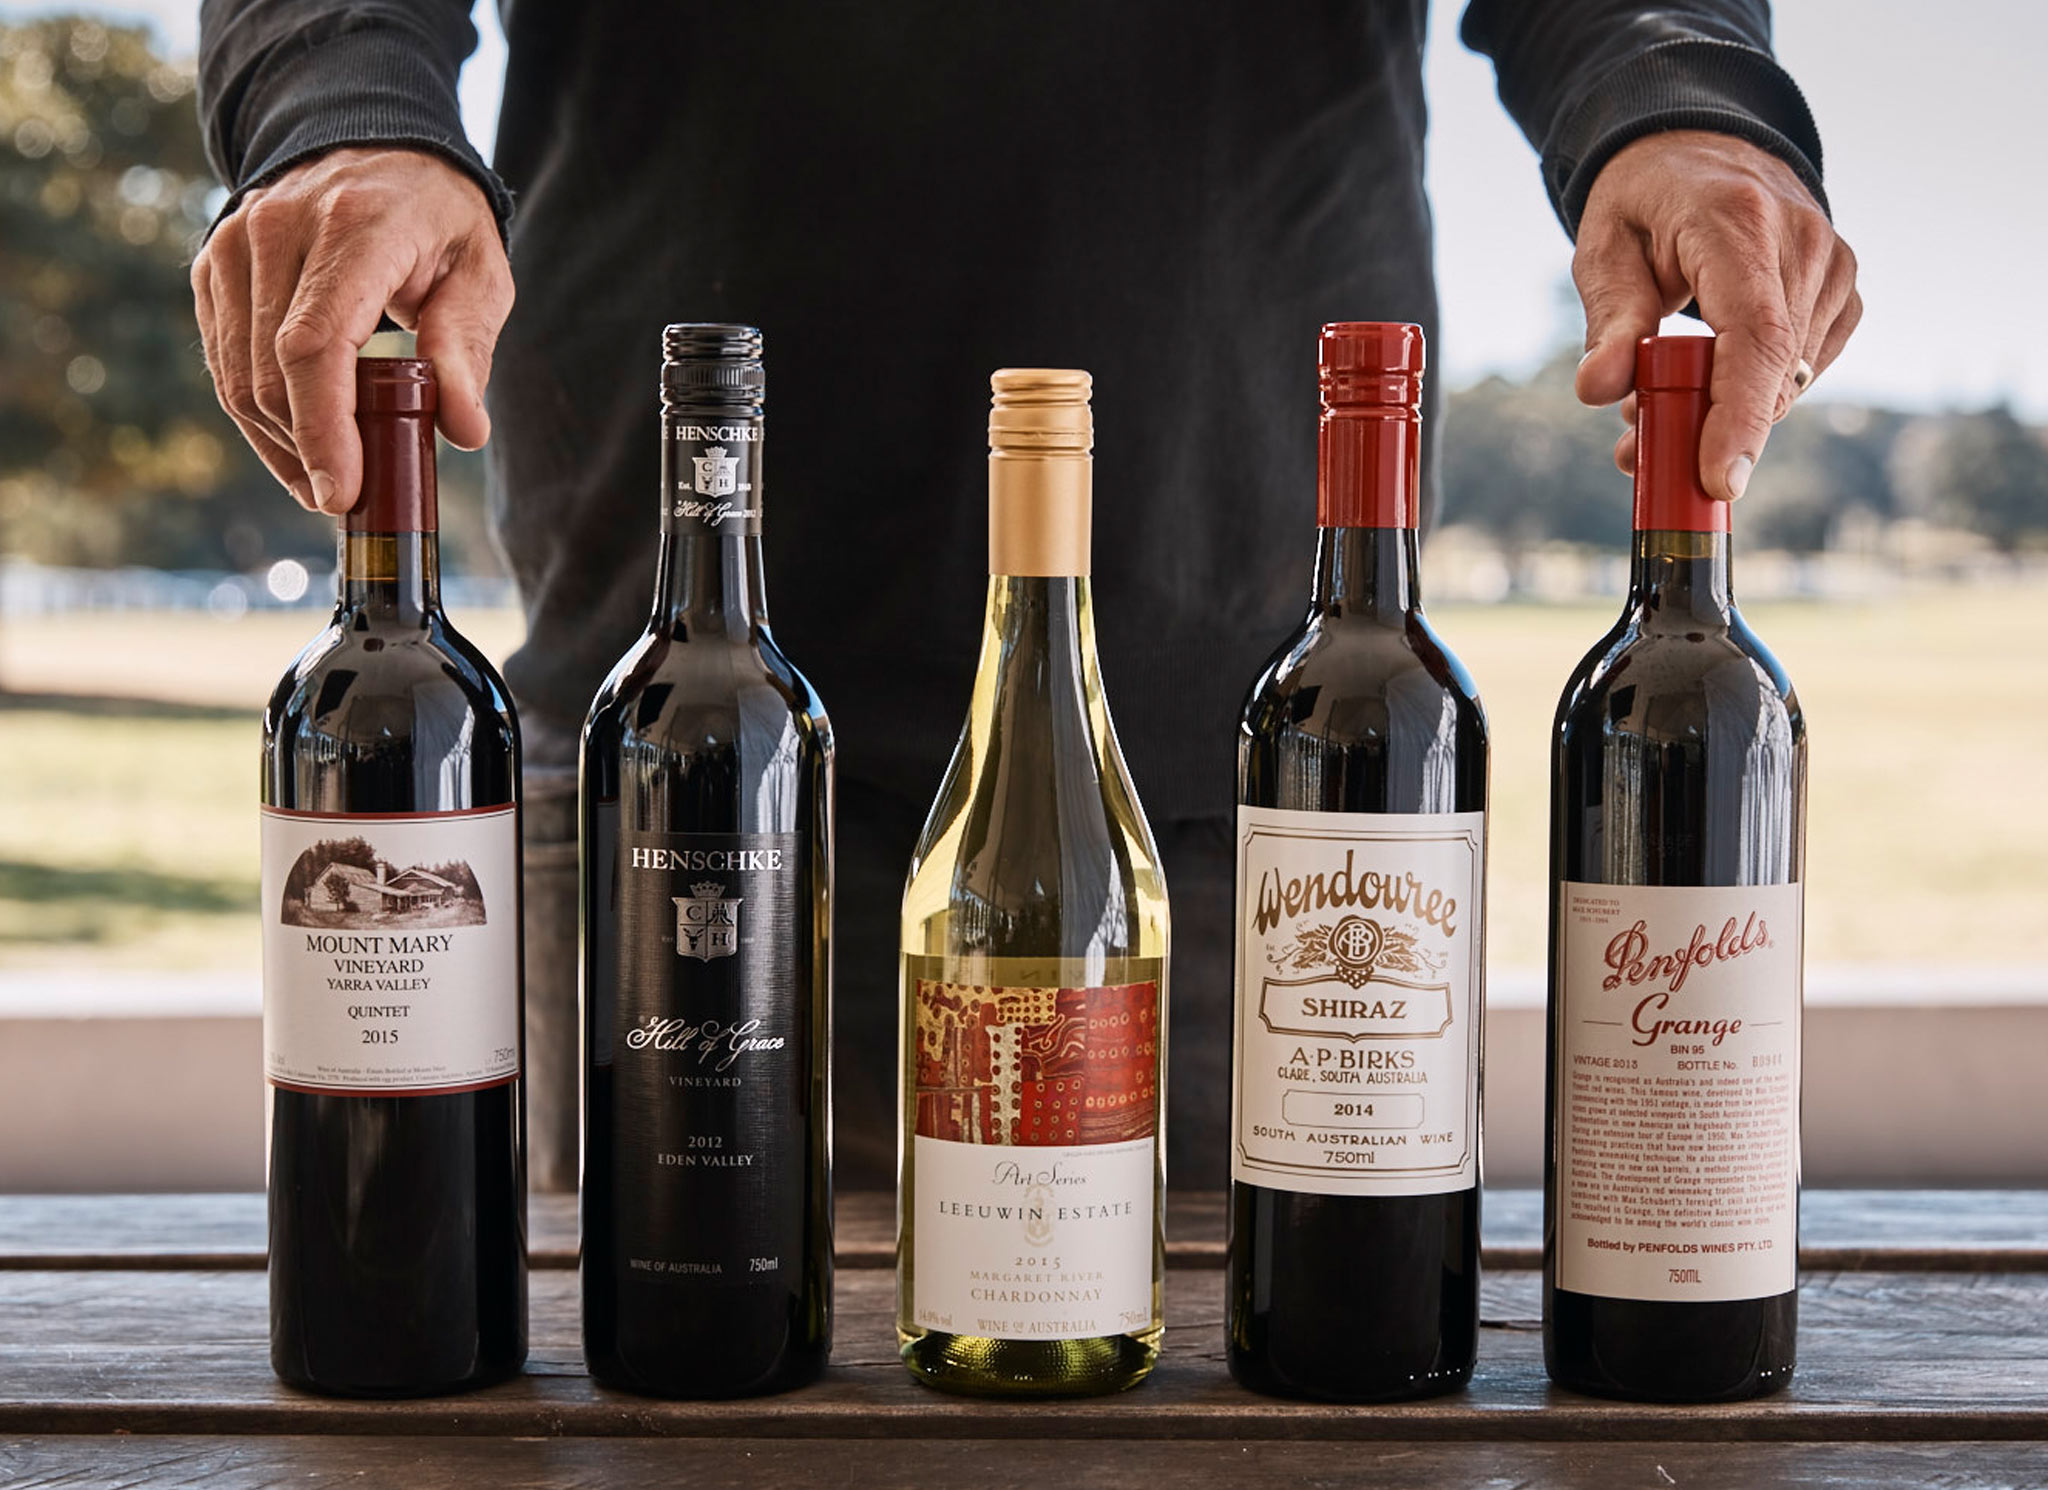 Australian wine anti-dumping probe to be fair, just: spokesperson